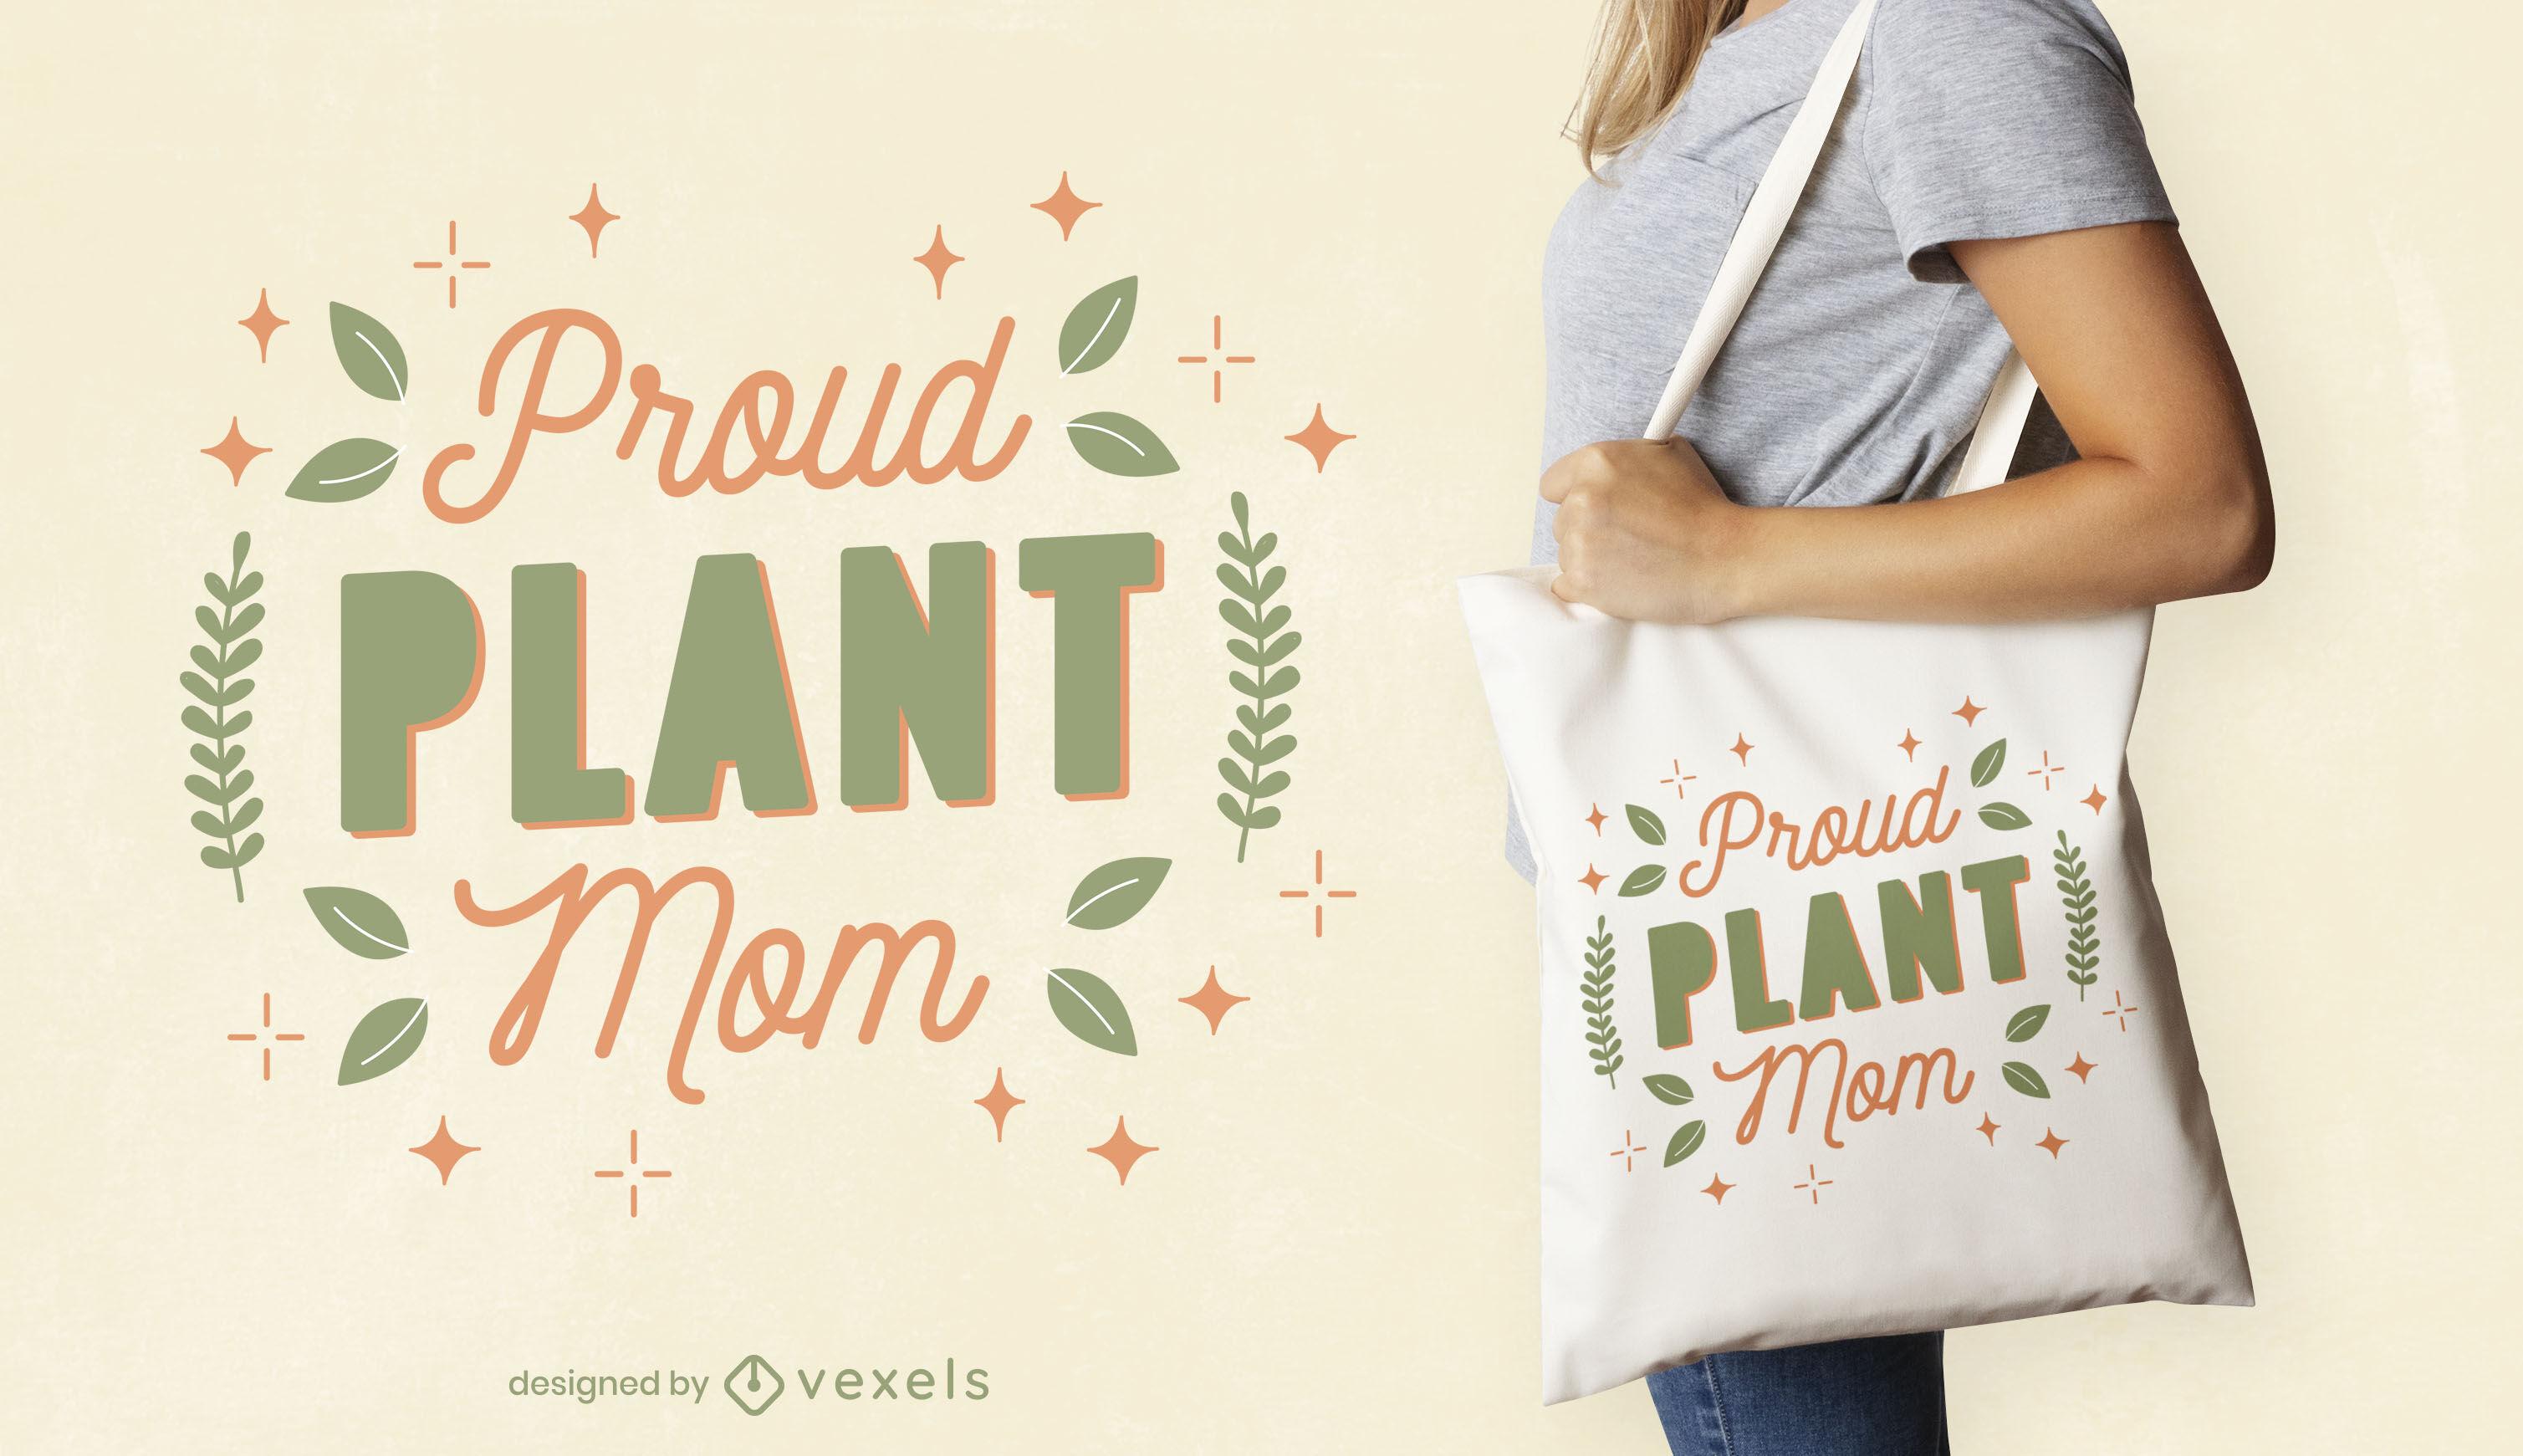 Proud plant mom tote bag design